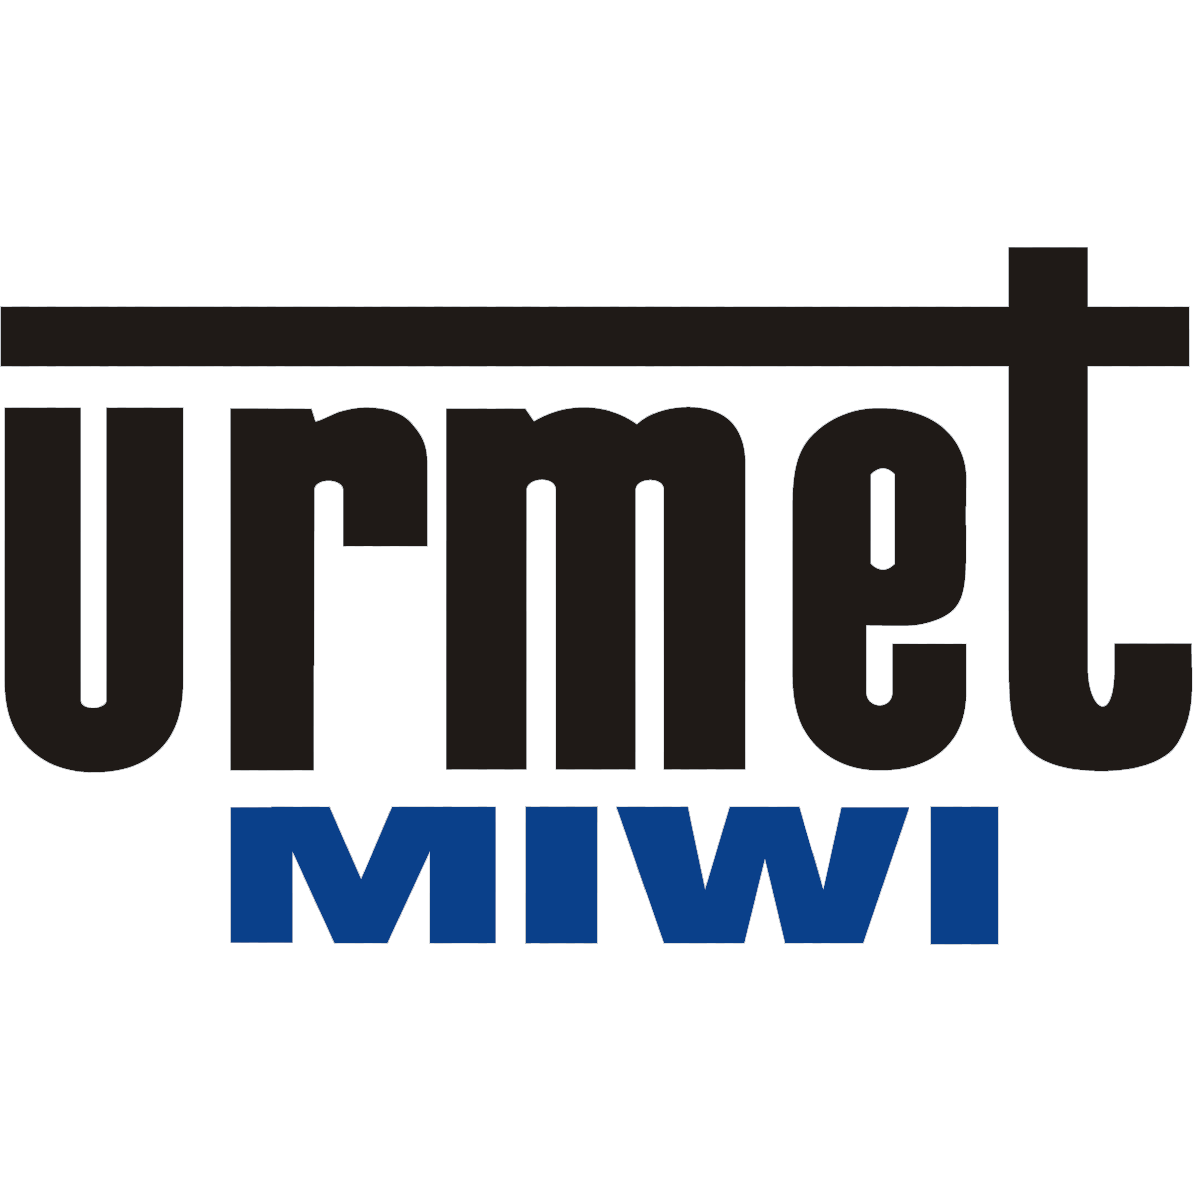 Logo Miwi Urmet